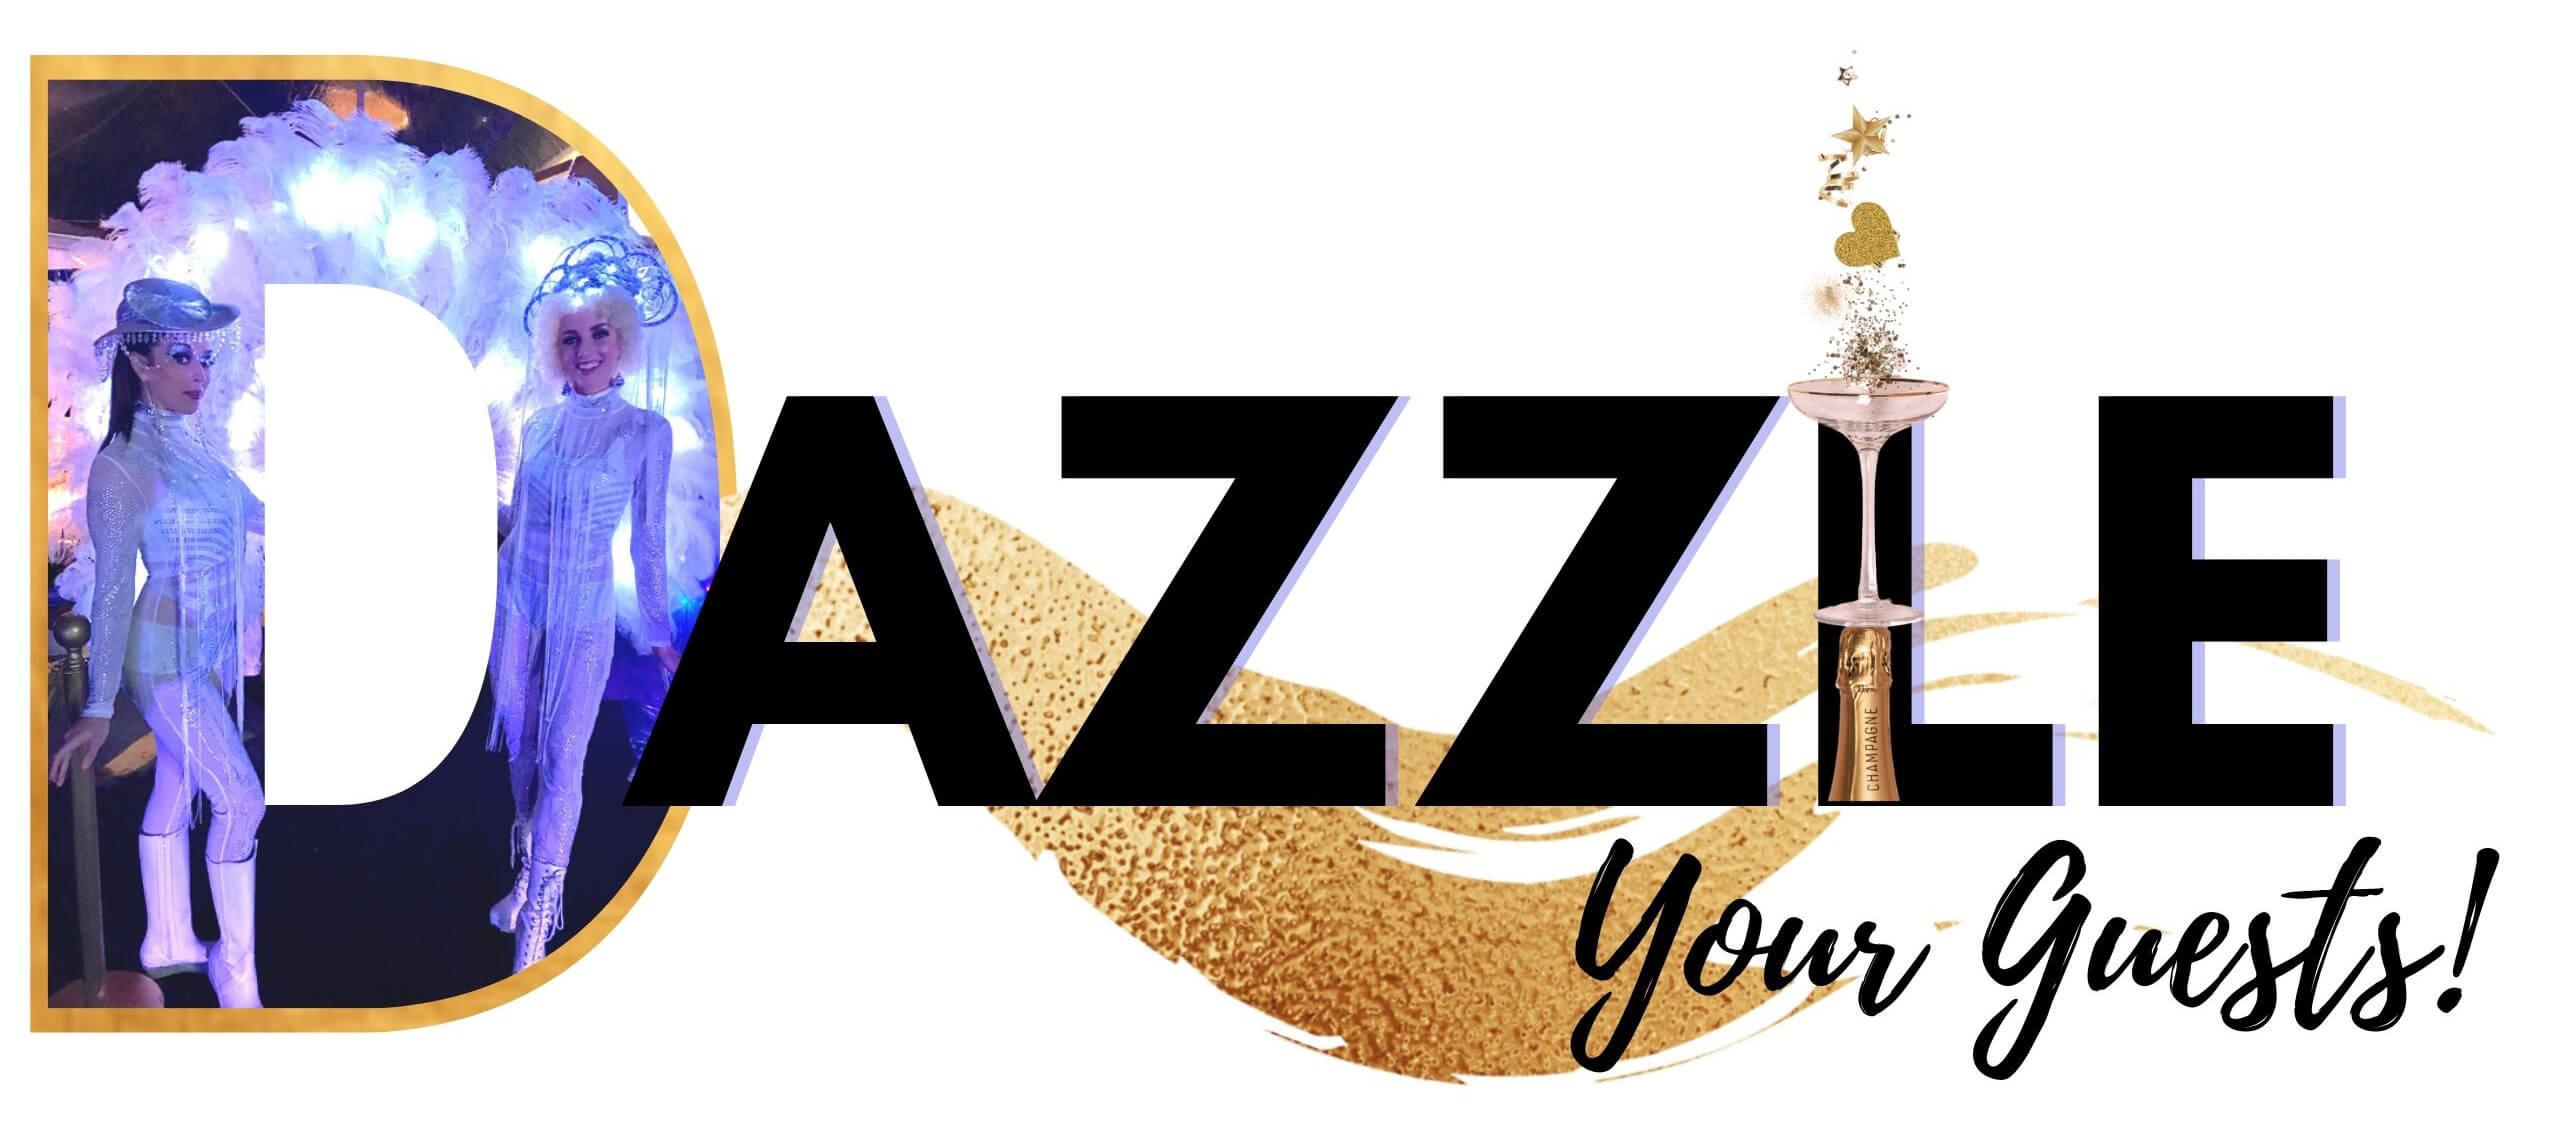 Dazzle your Guests + Catalyst Arts Entertainment